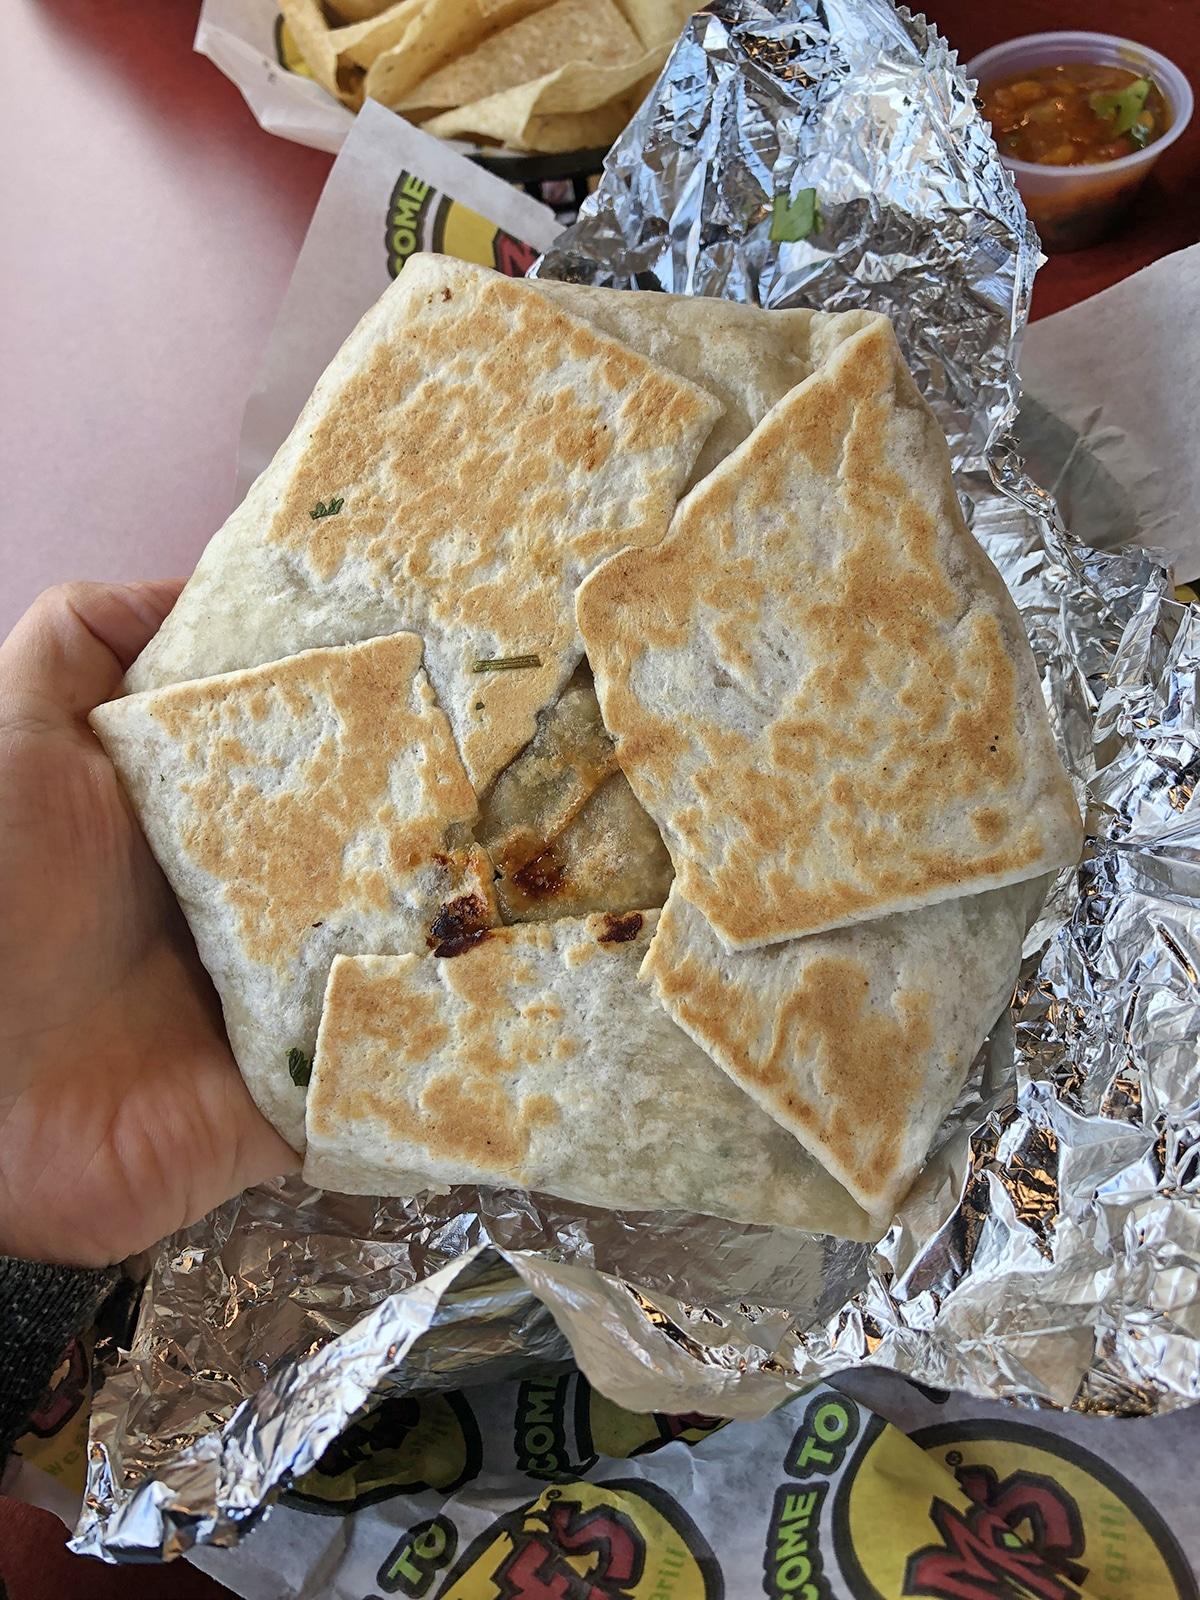 Vegan crunch wrap at Moe's Southwest Grill.